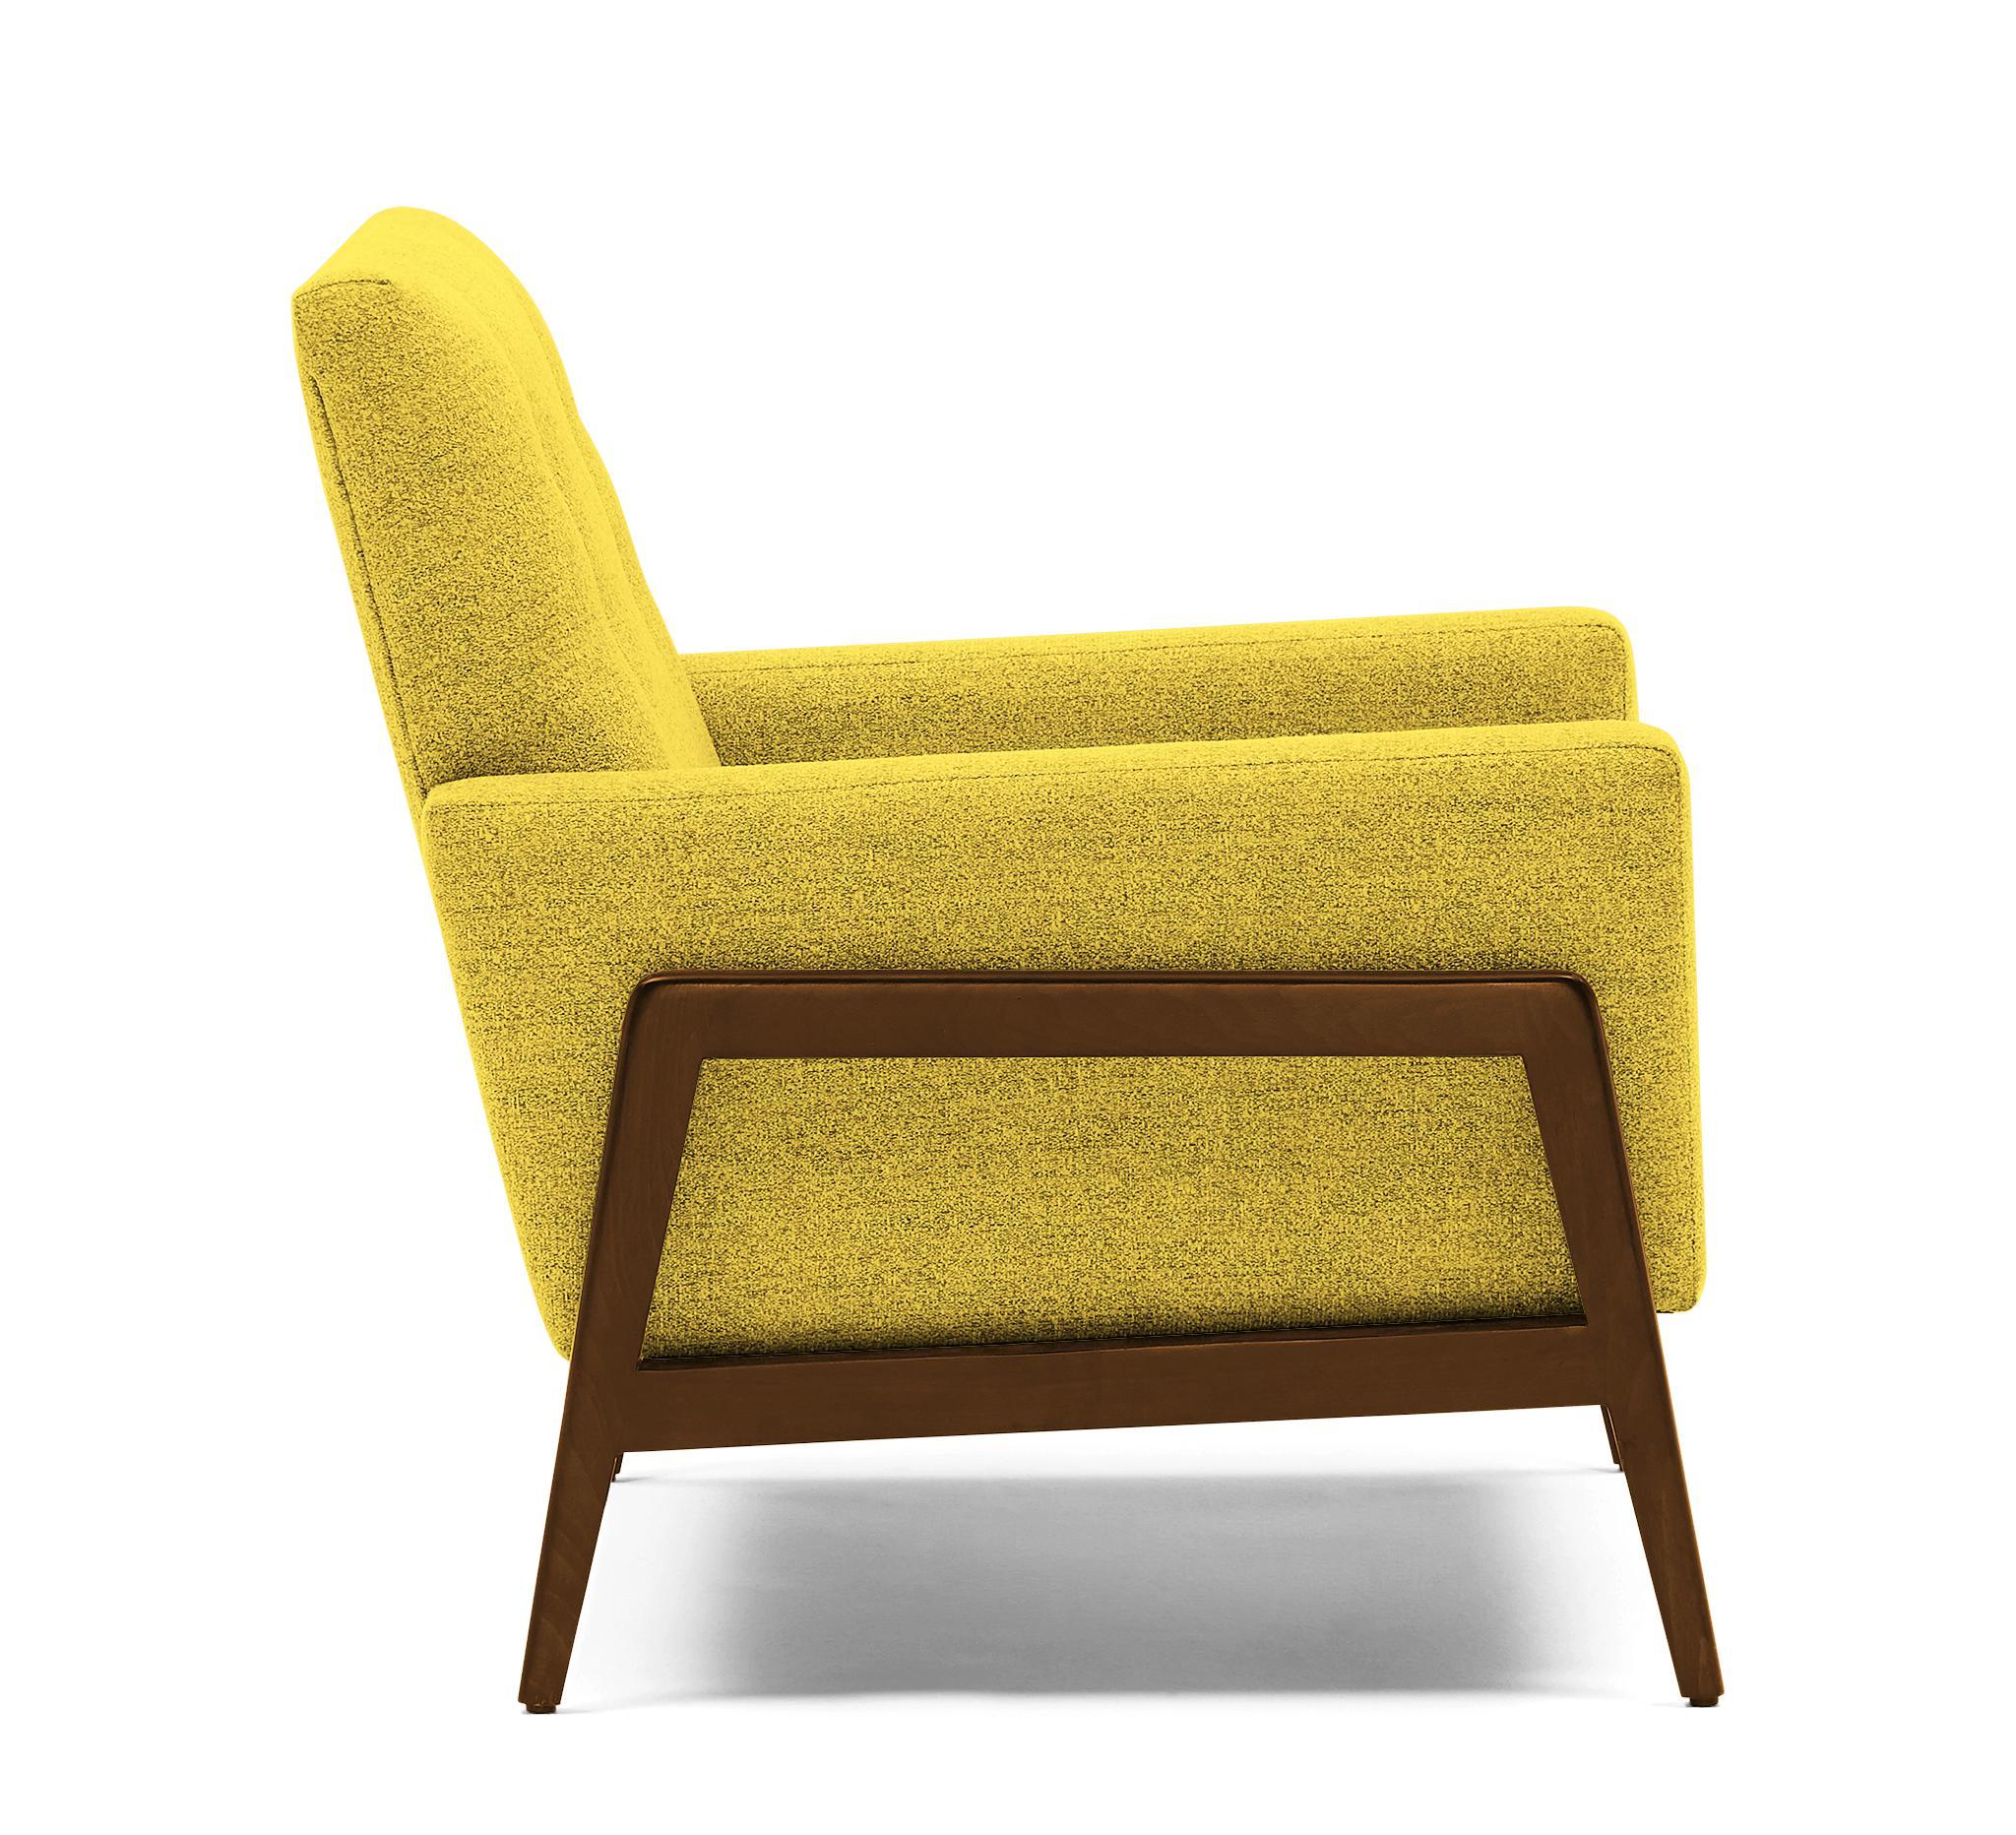 Yellow Clyde Mid Century Modern Chair - Taylor Golden - Mocha